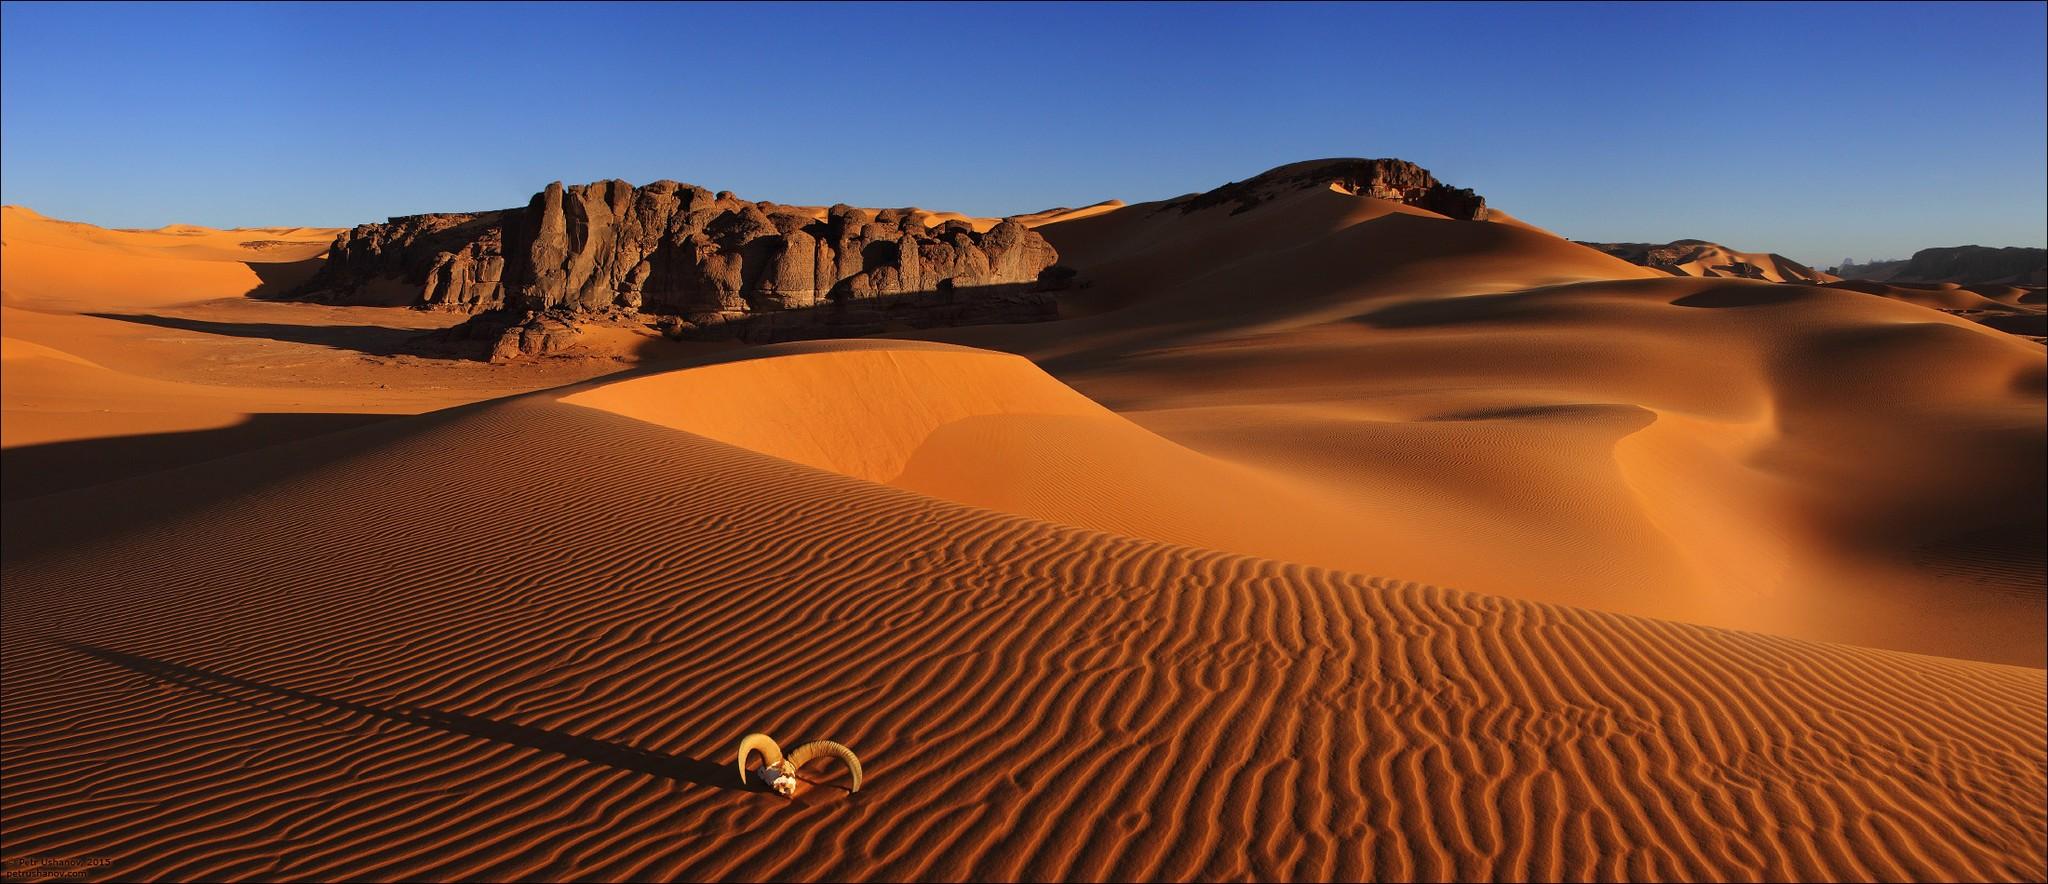 Профилактика и лечение заболеваний в условиях пустыни